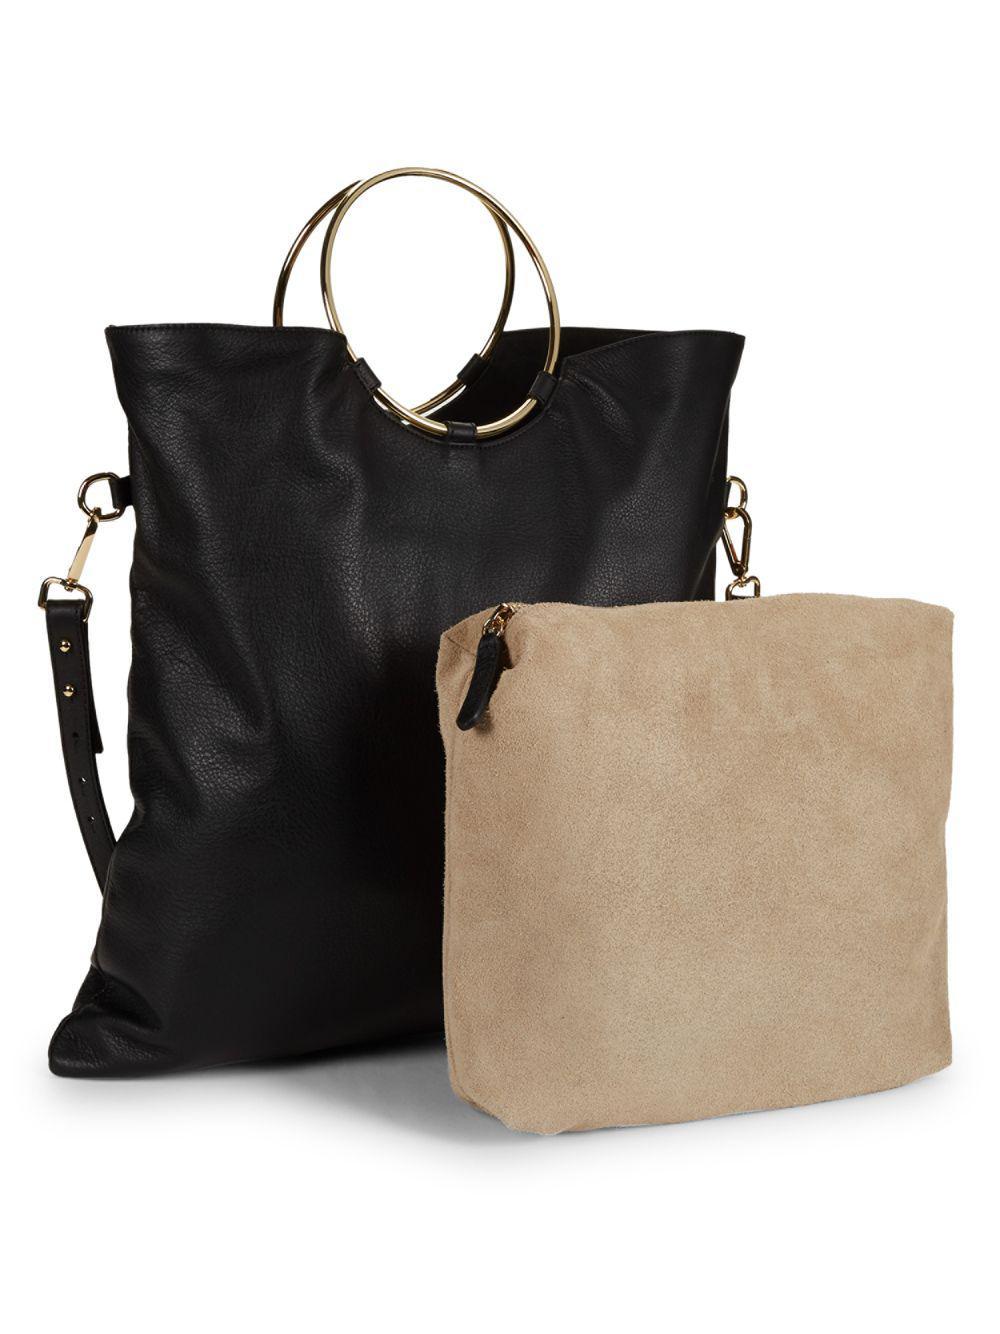 81417b049a Valentino By Mario Valentino - Black Logo Leather Top Handle Bag - Lyst.  View fullscreen